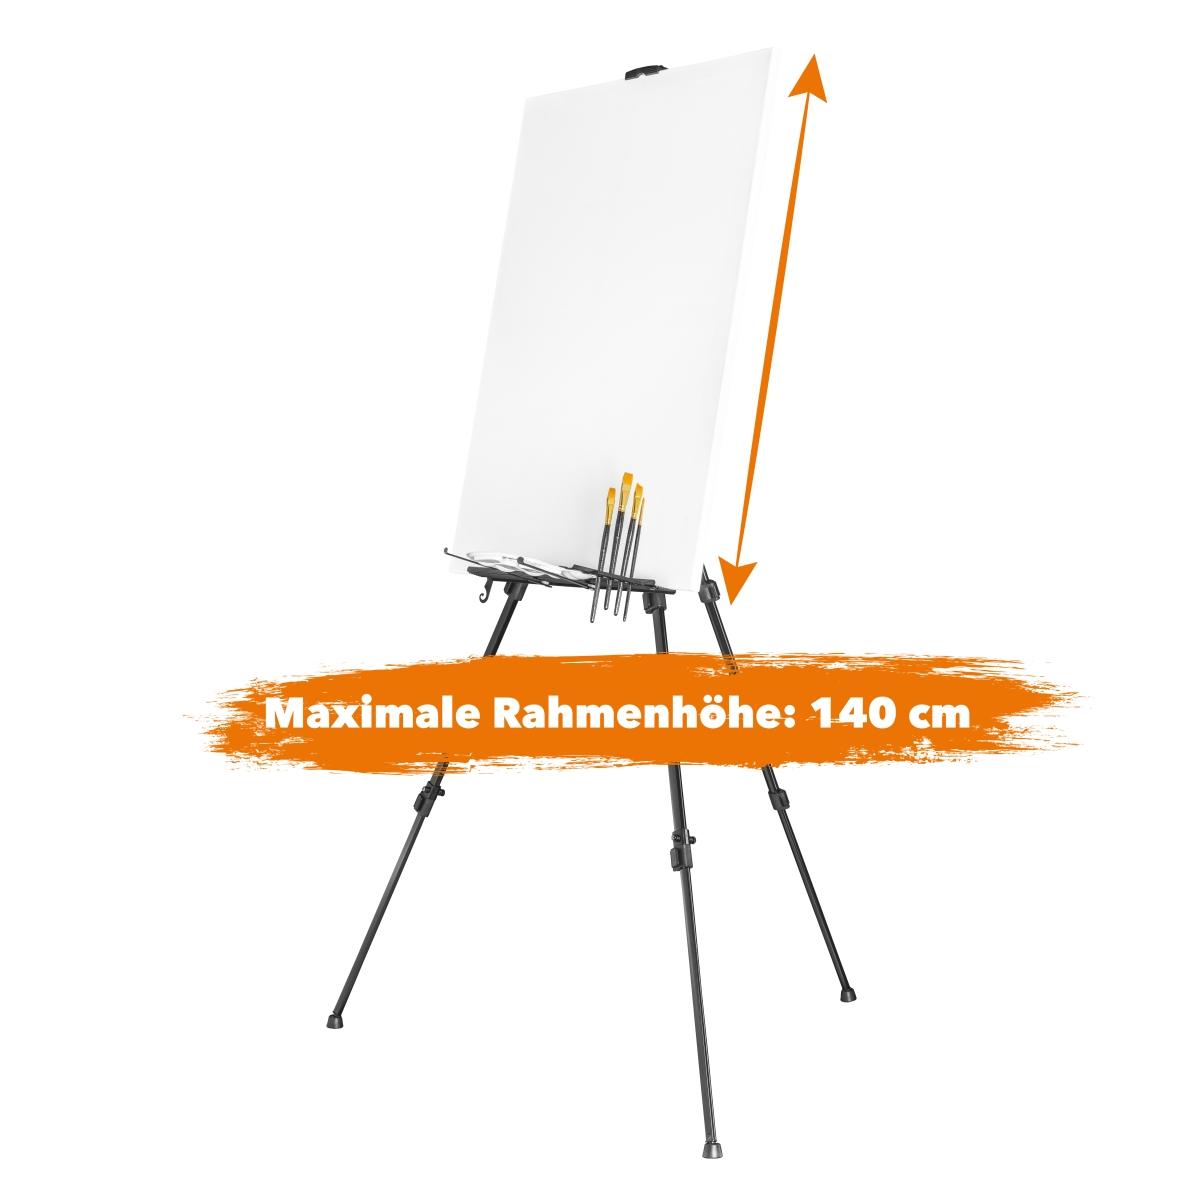 walimex pro Aluminium Atelierstaffelei//Malstaffelei XL 180cm bis 6kg belastbar